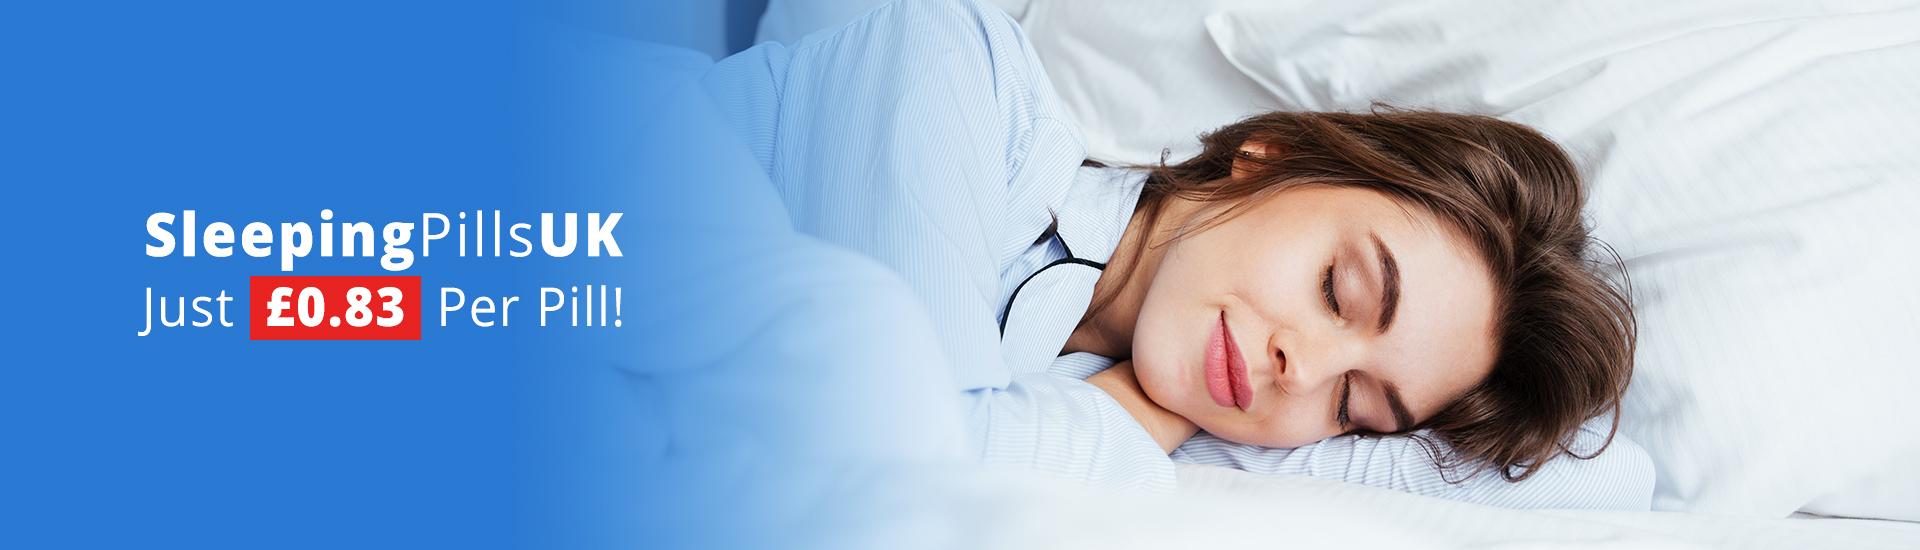 Best Sleeping Pills UK